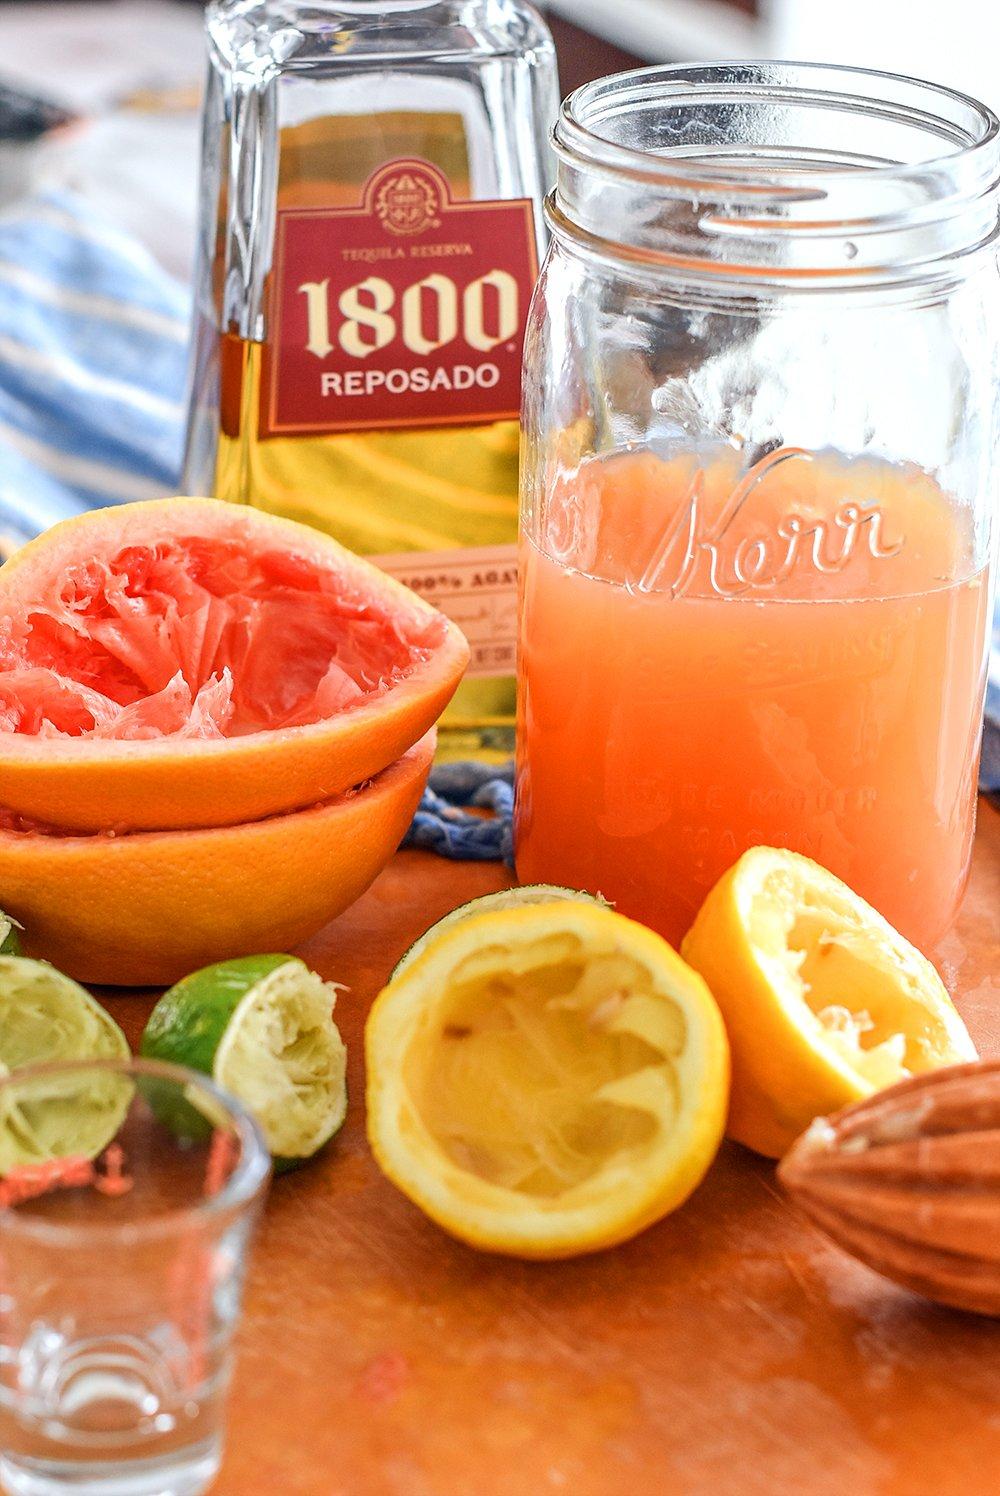 Gold tequila, grapefruit, limes, and lemons for margaritas